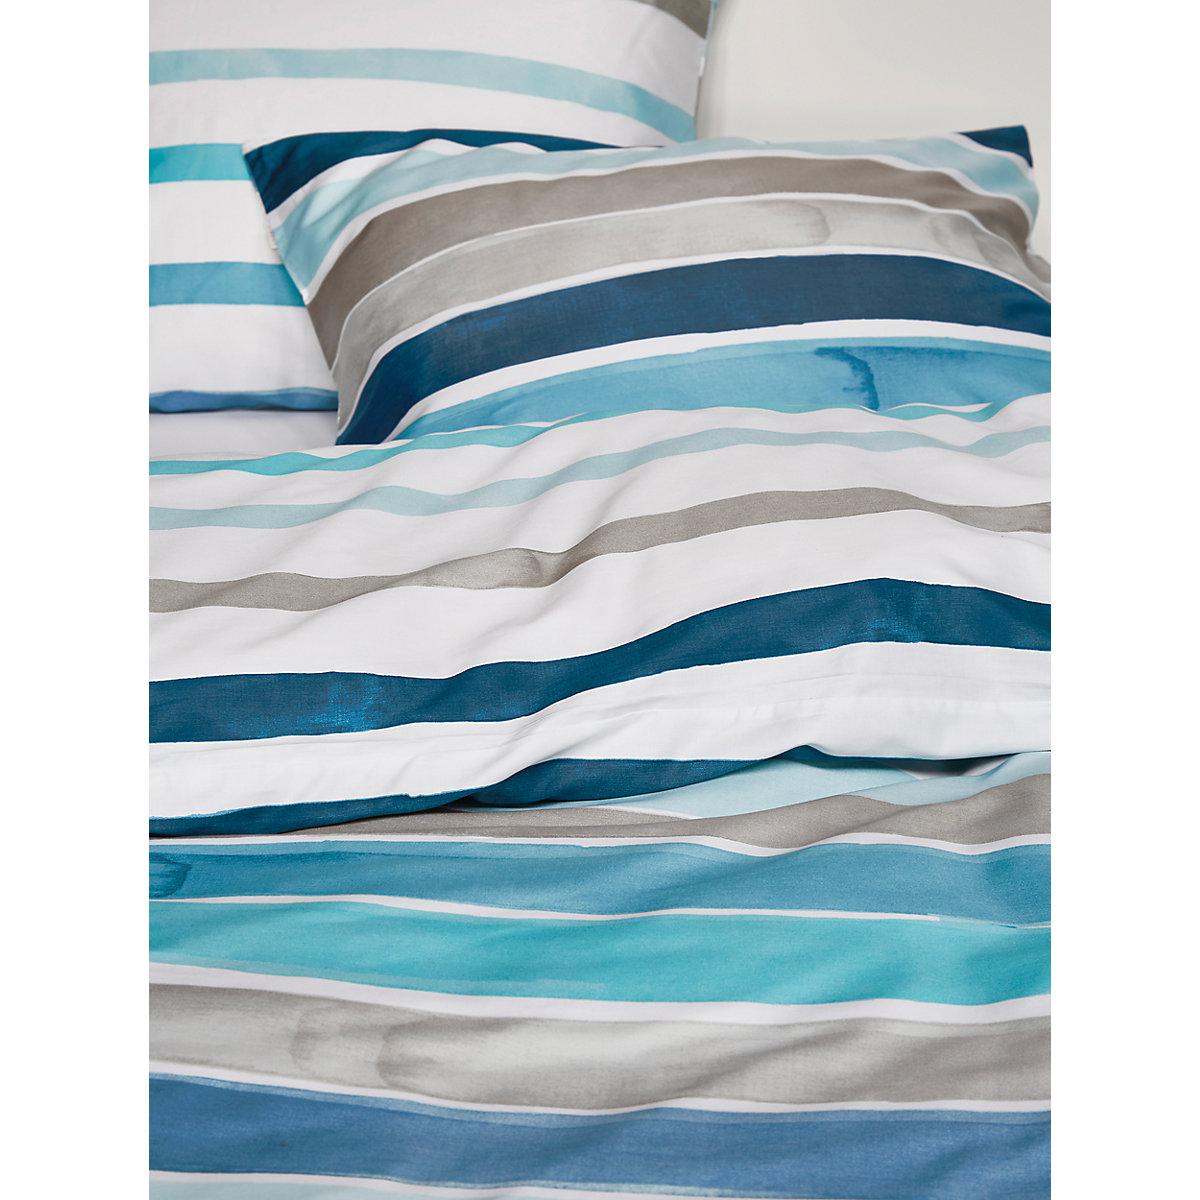 bettw sche iva aus satin blau esprit yomonda. Black Bedroom Furniture Sets. Home Design Ideas